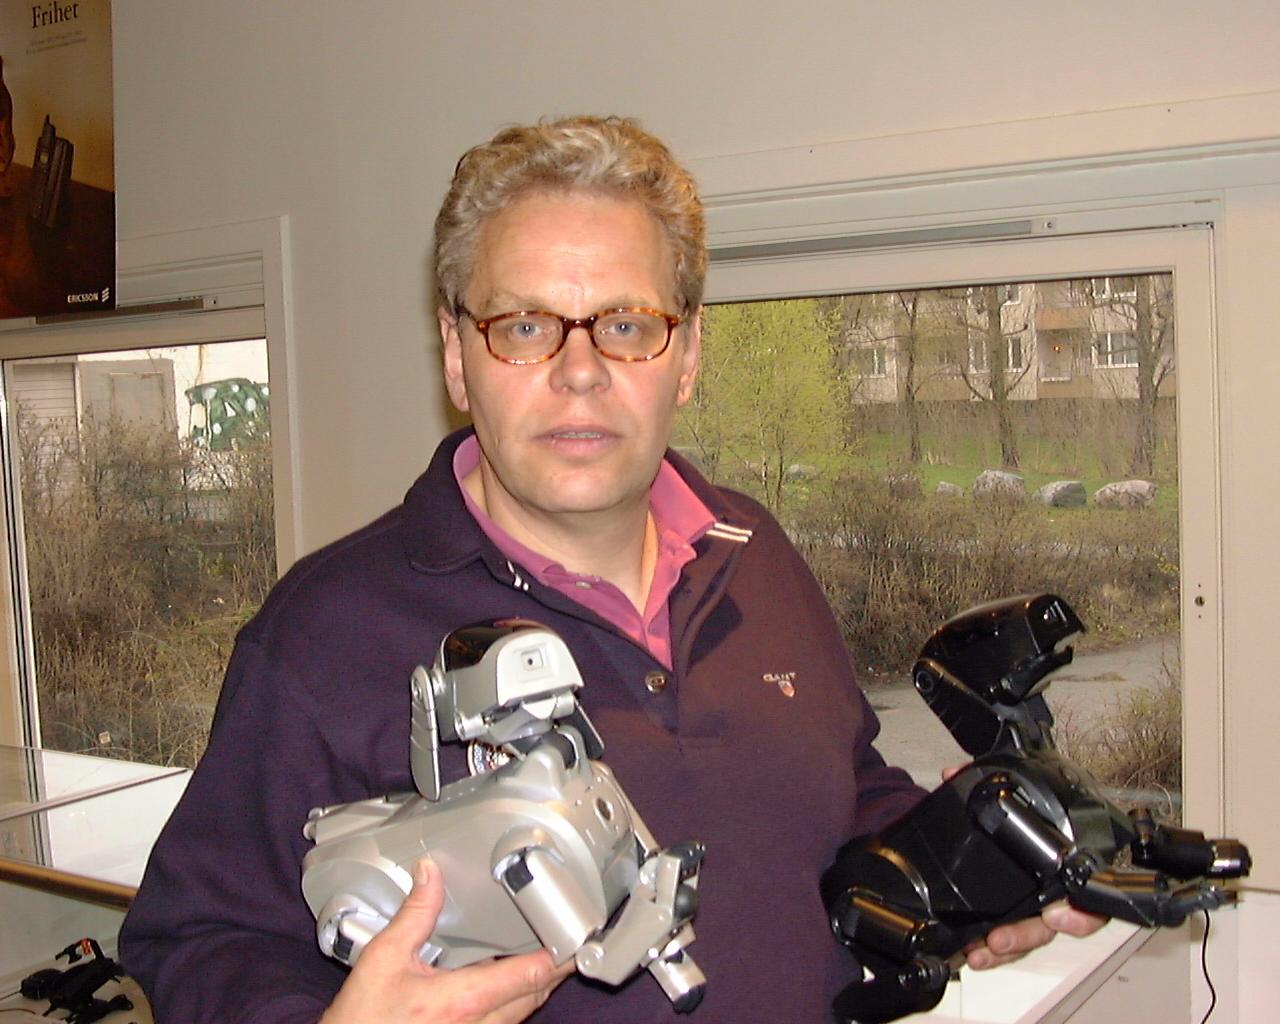 elektronikk,laser,foto,måleinstrumenter